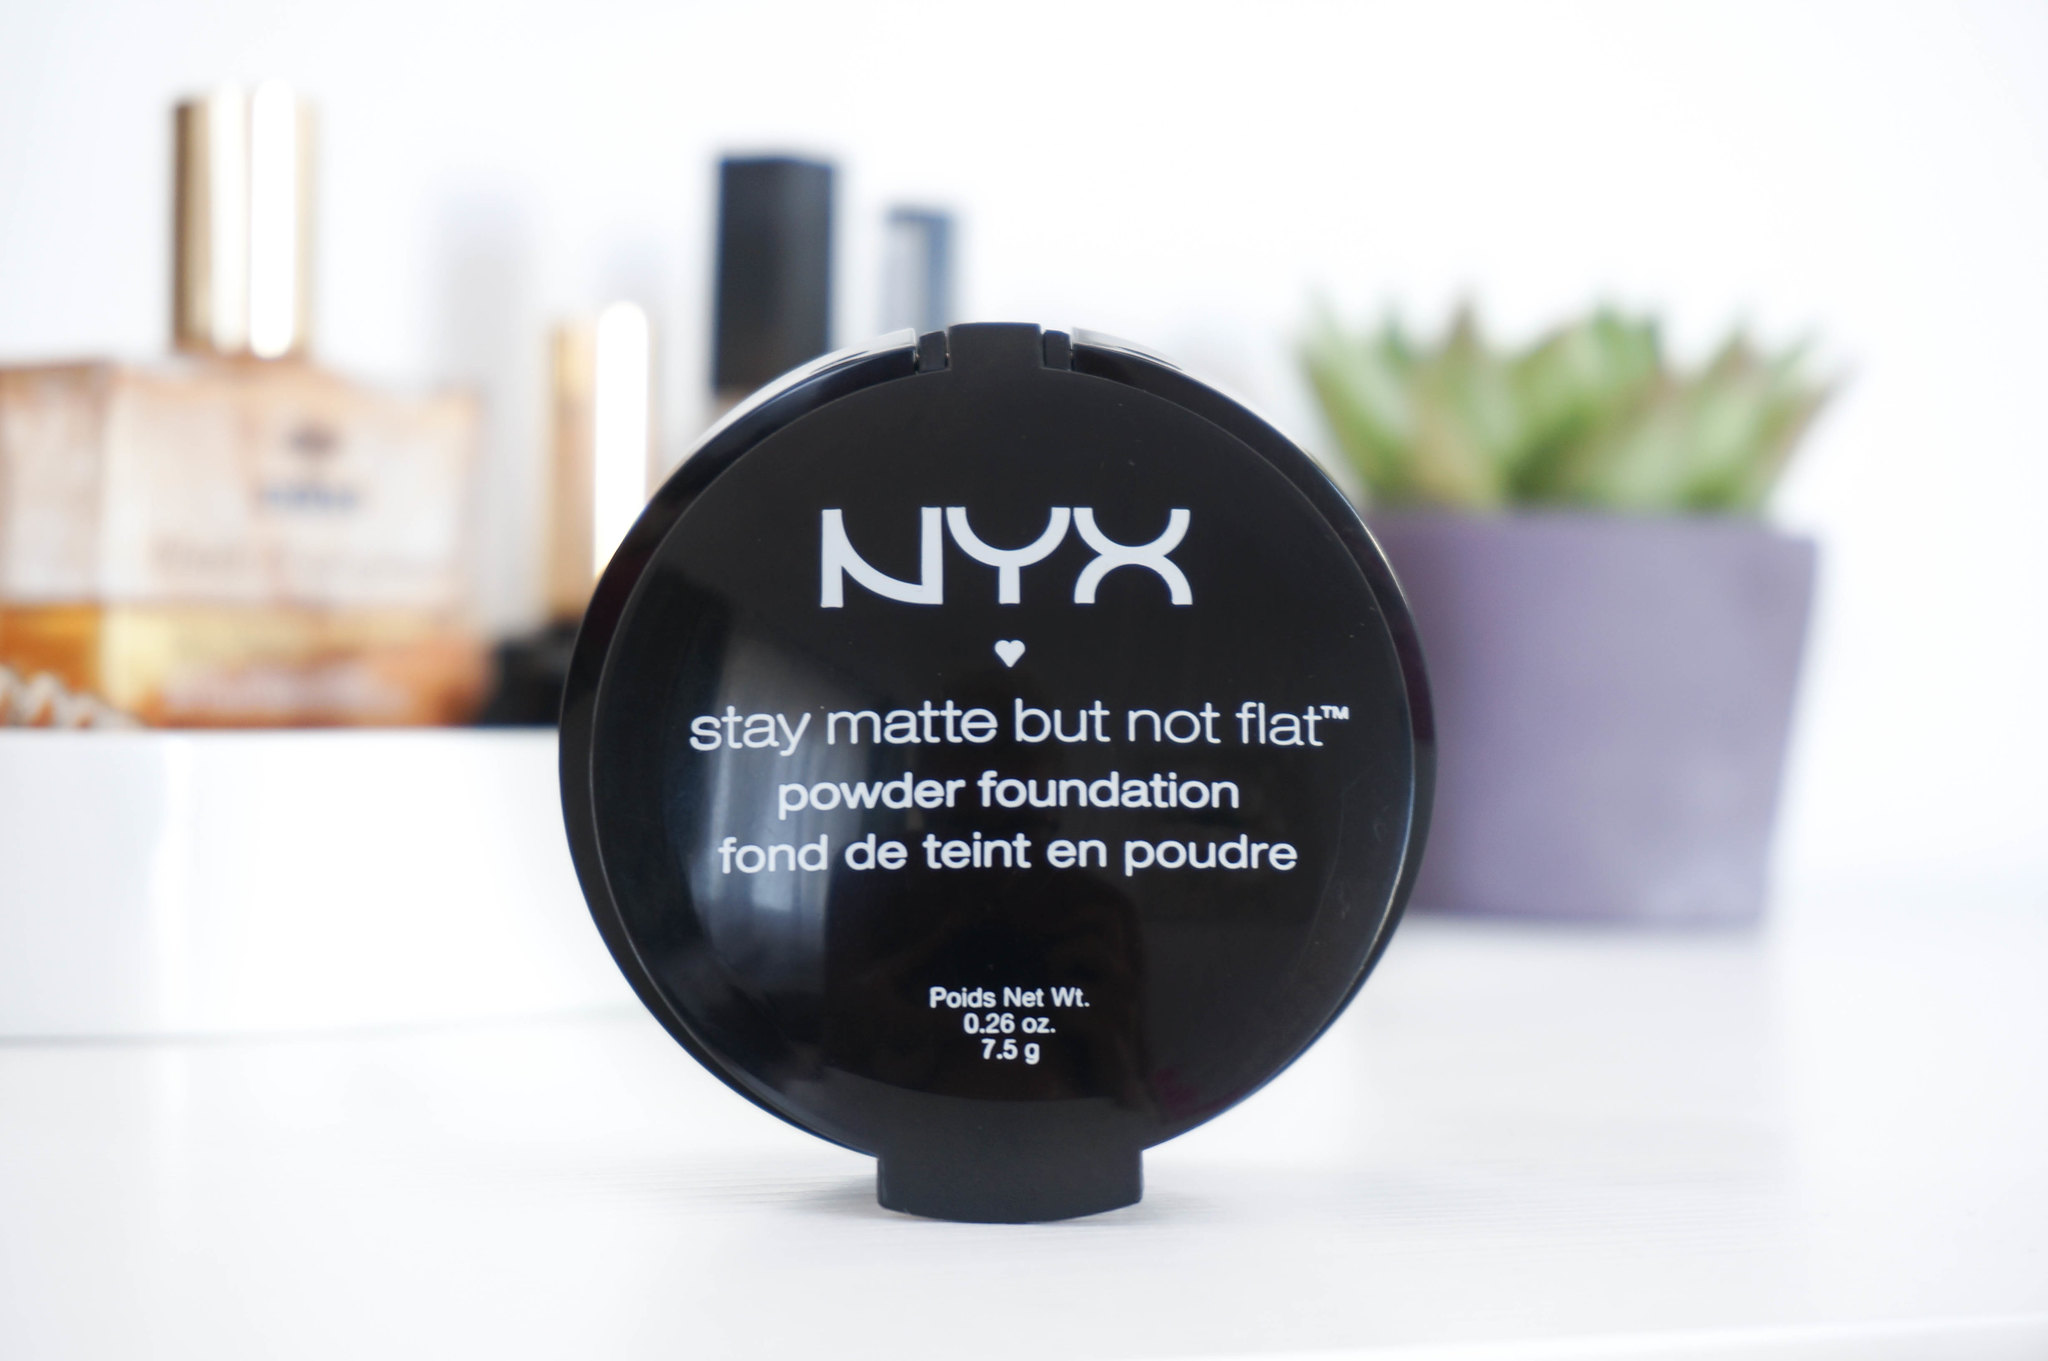 NYX-stay-matte-but-not-flat-powder-foundation-review-kompaktinis-makiazo-pagrindas